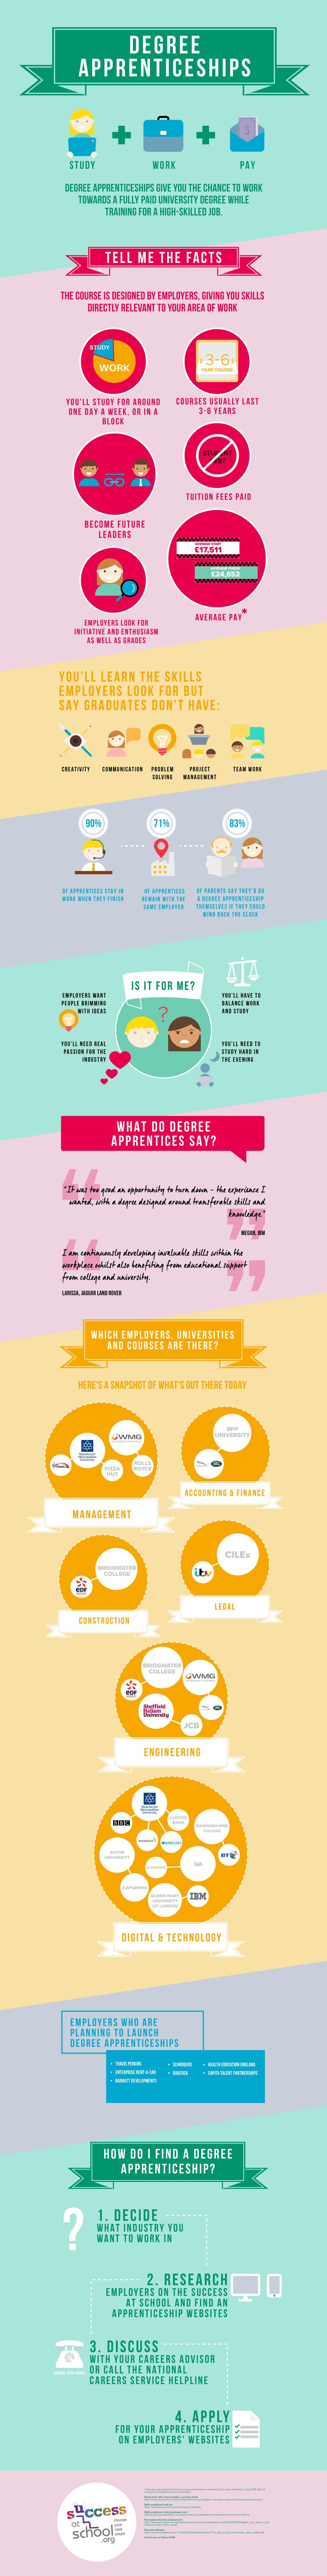 Degree apprenticeships infographic